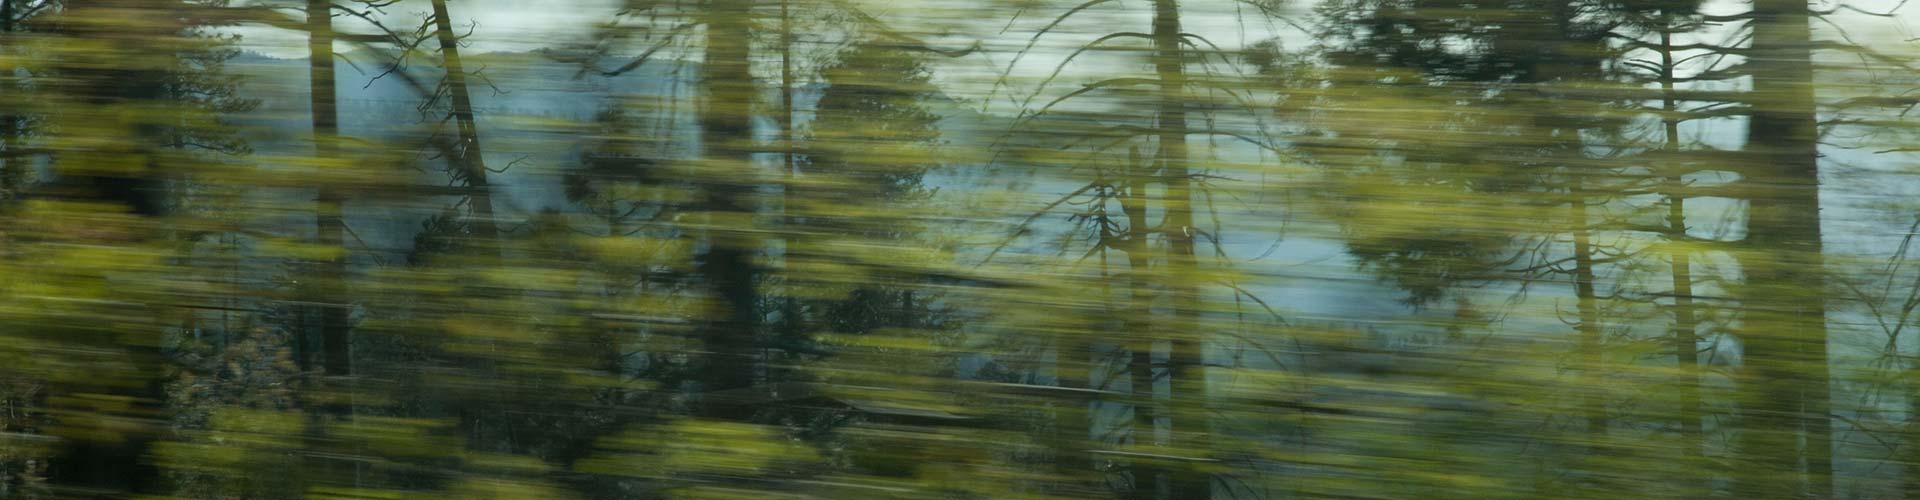 banner-bomen